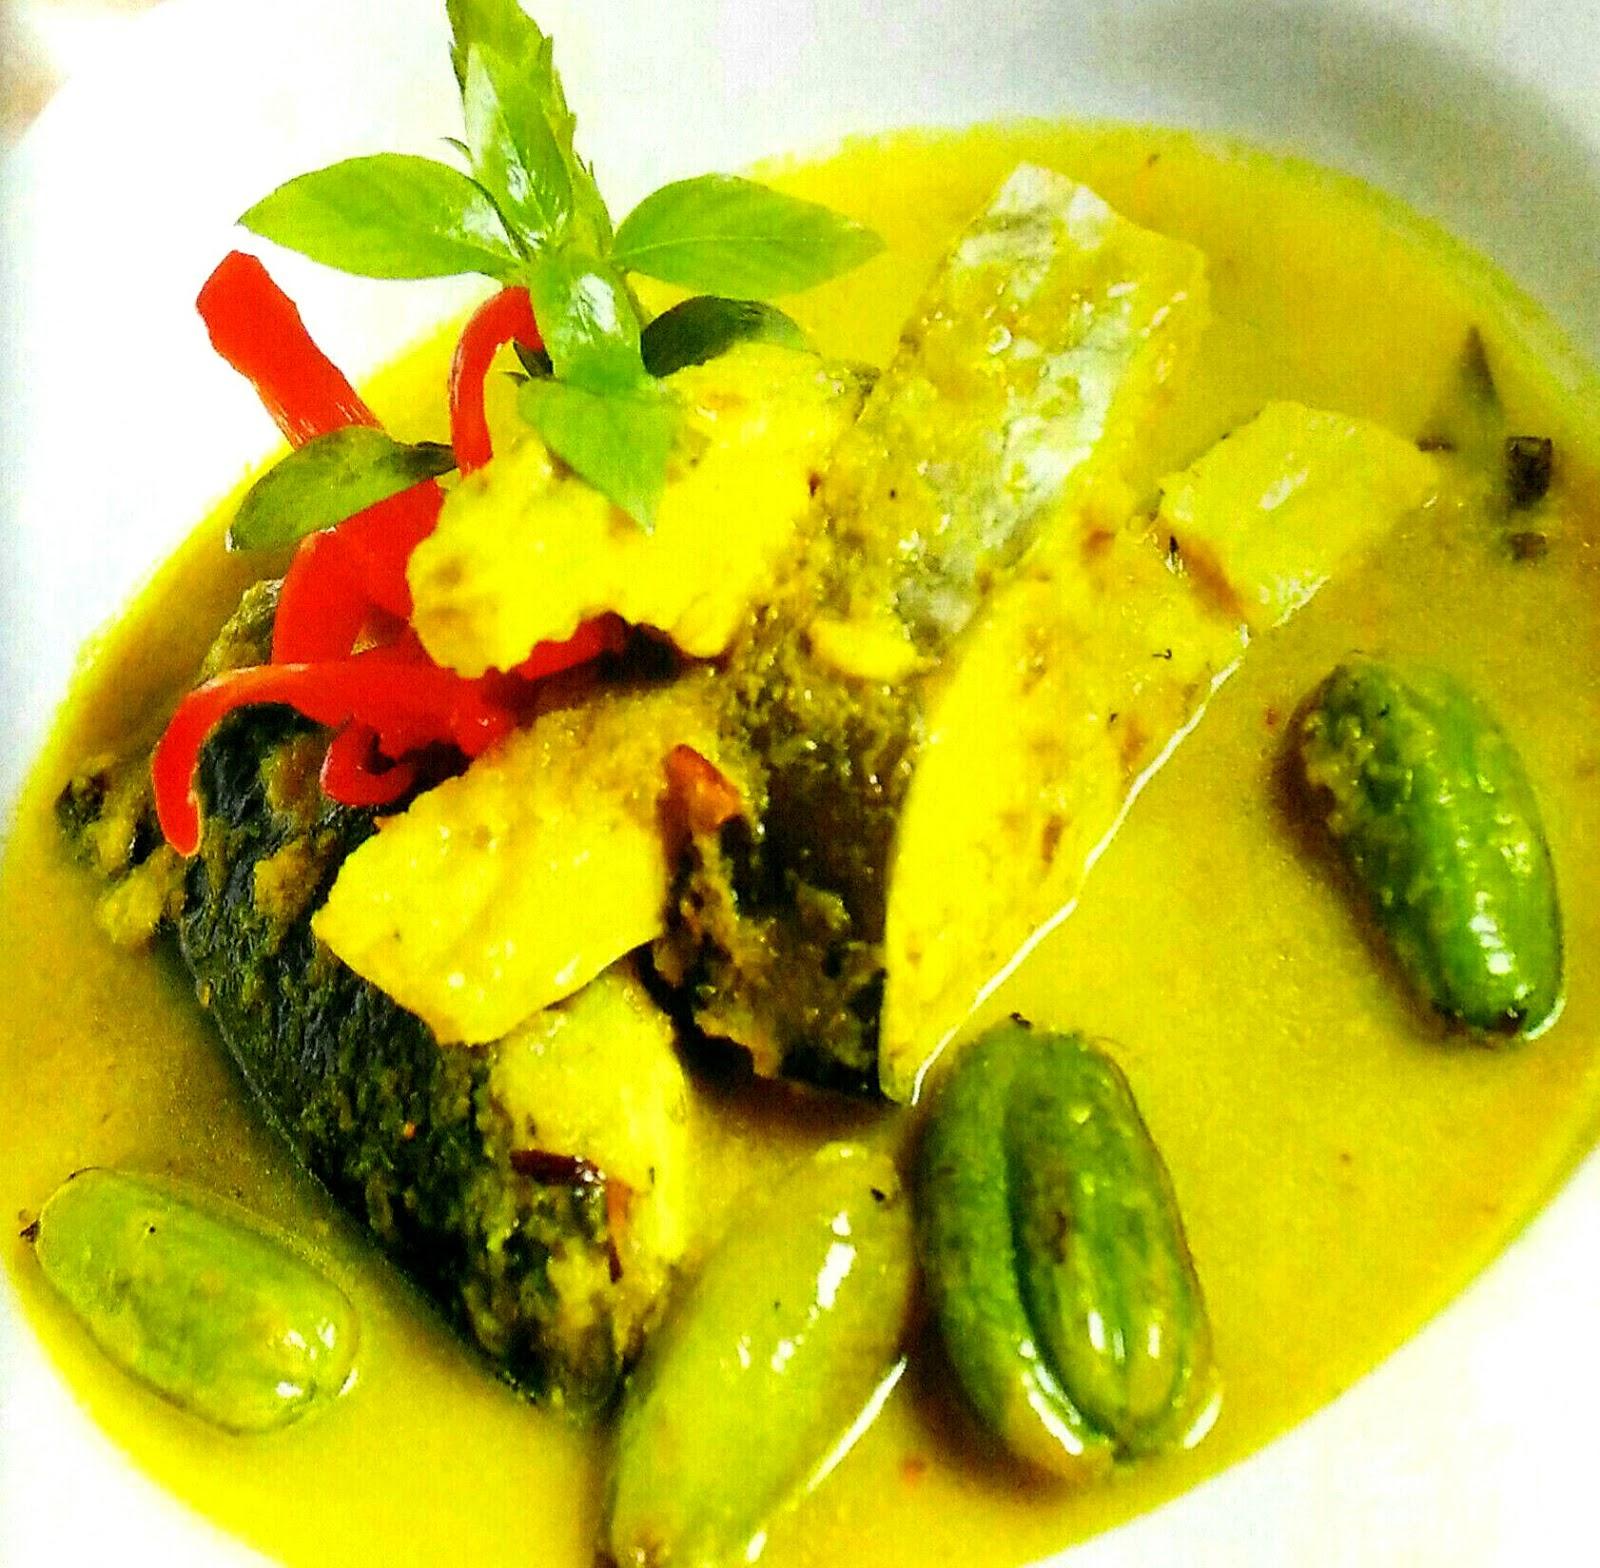 resepi ikan patin tempoyak sedap resep masakan khas Resepi Ikan Rohu Masak Tempoyak Enak dan Mudah